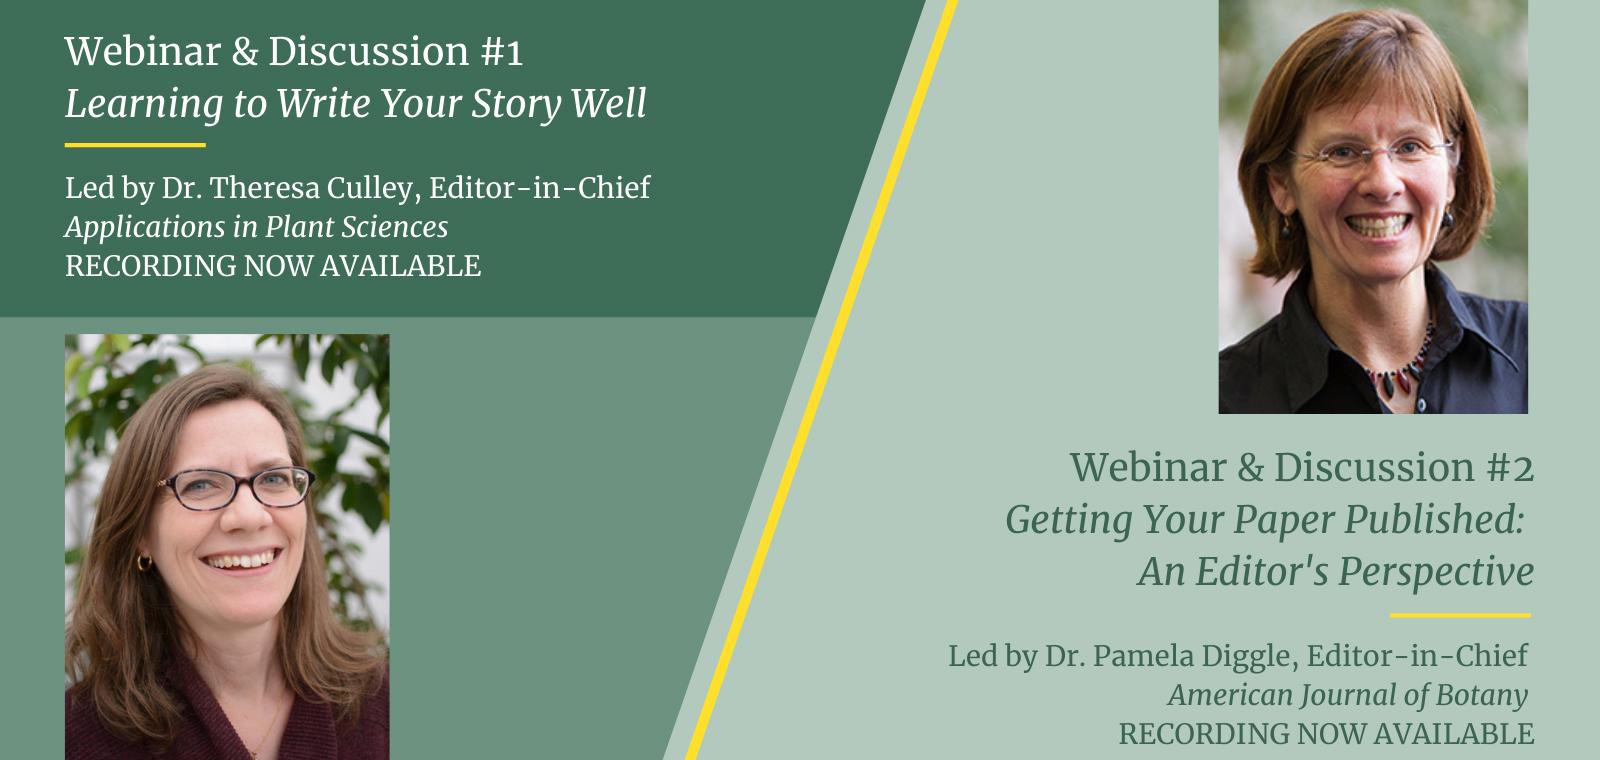 BSA Webinars 2020